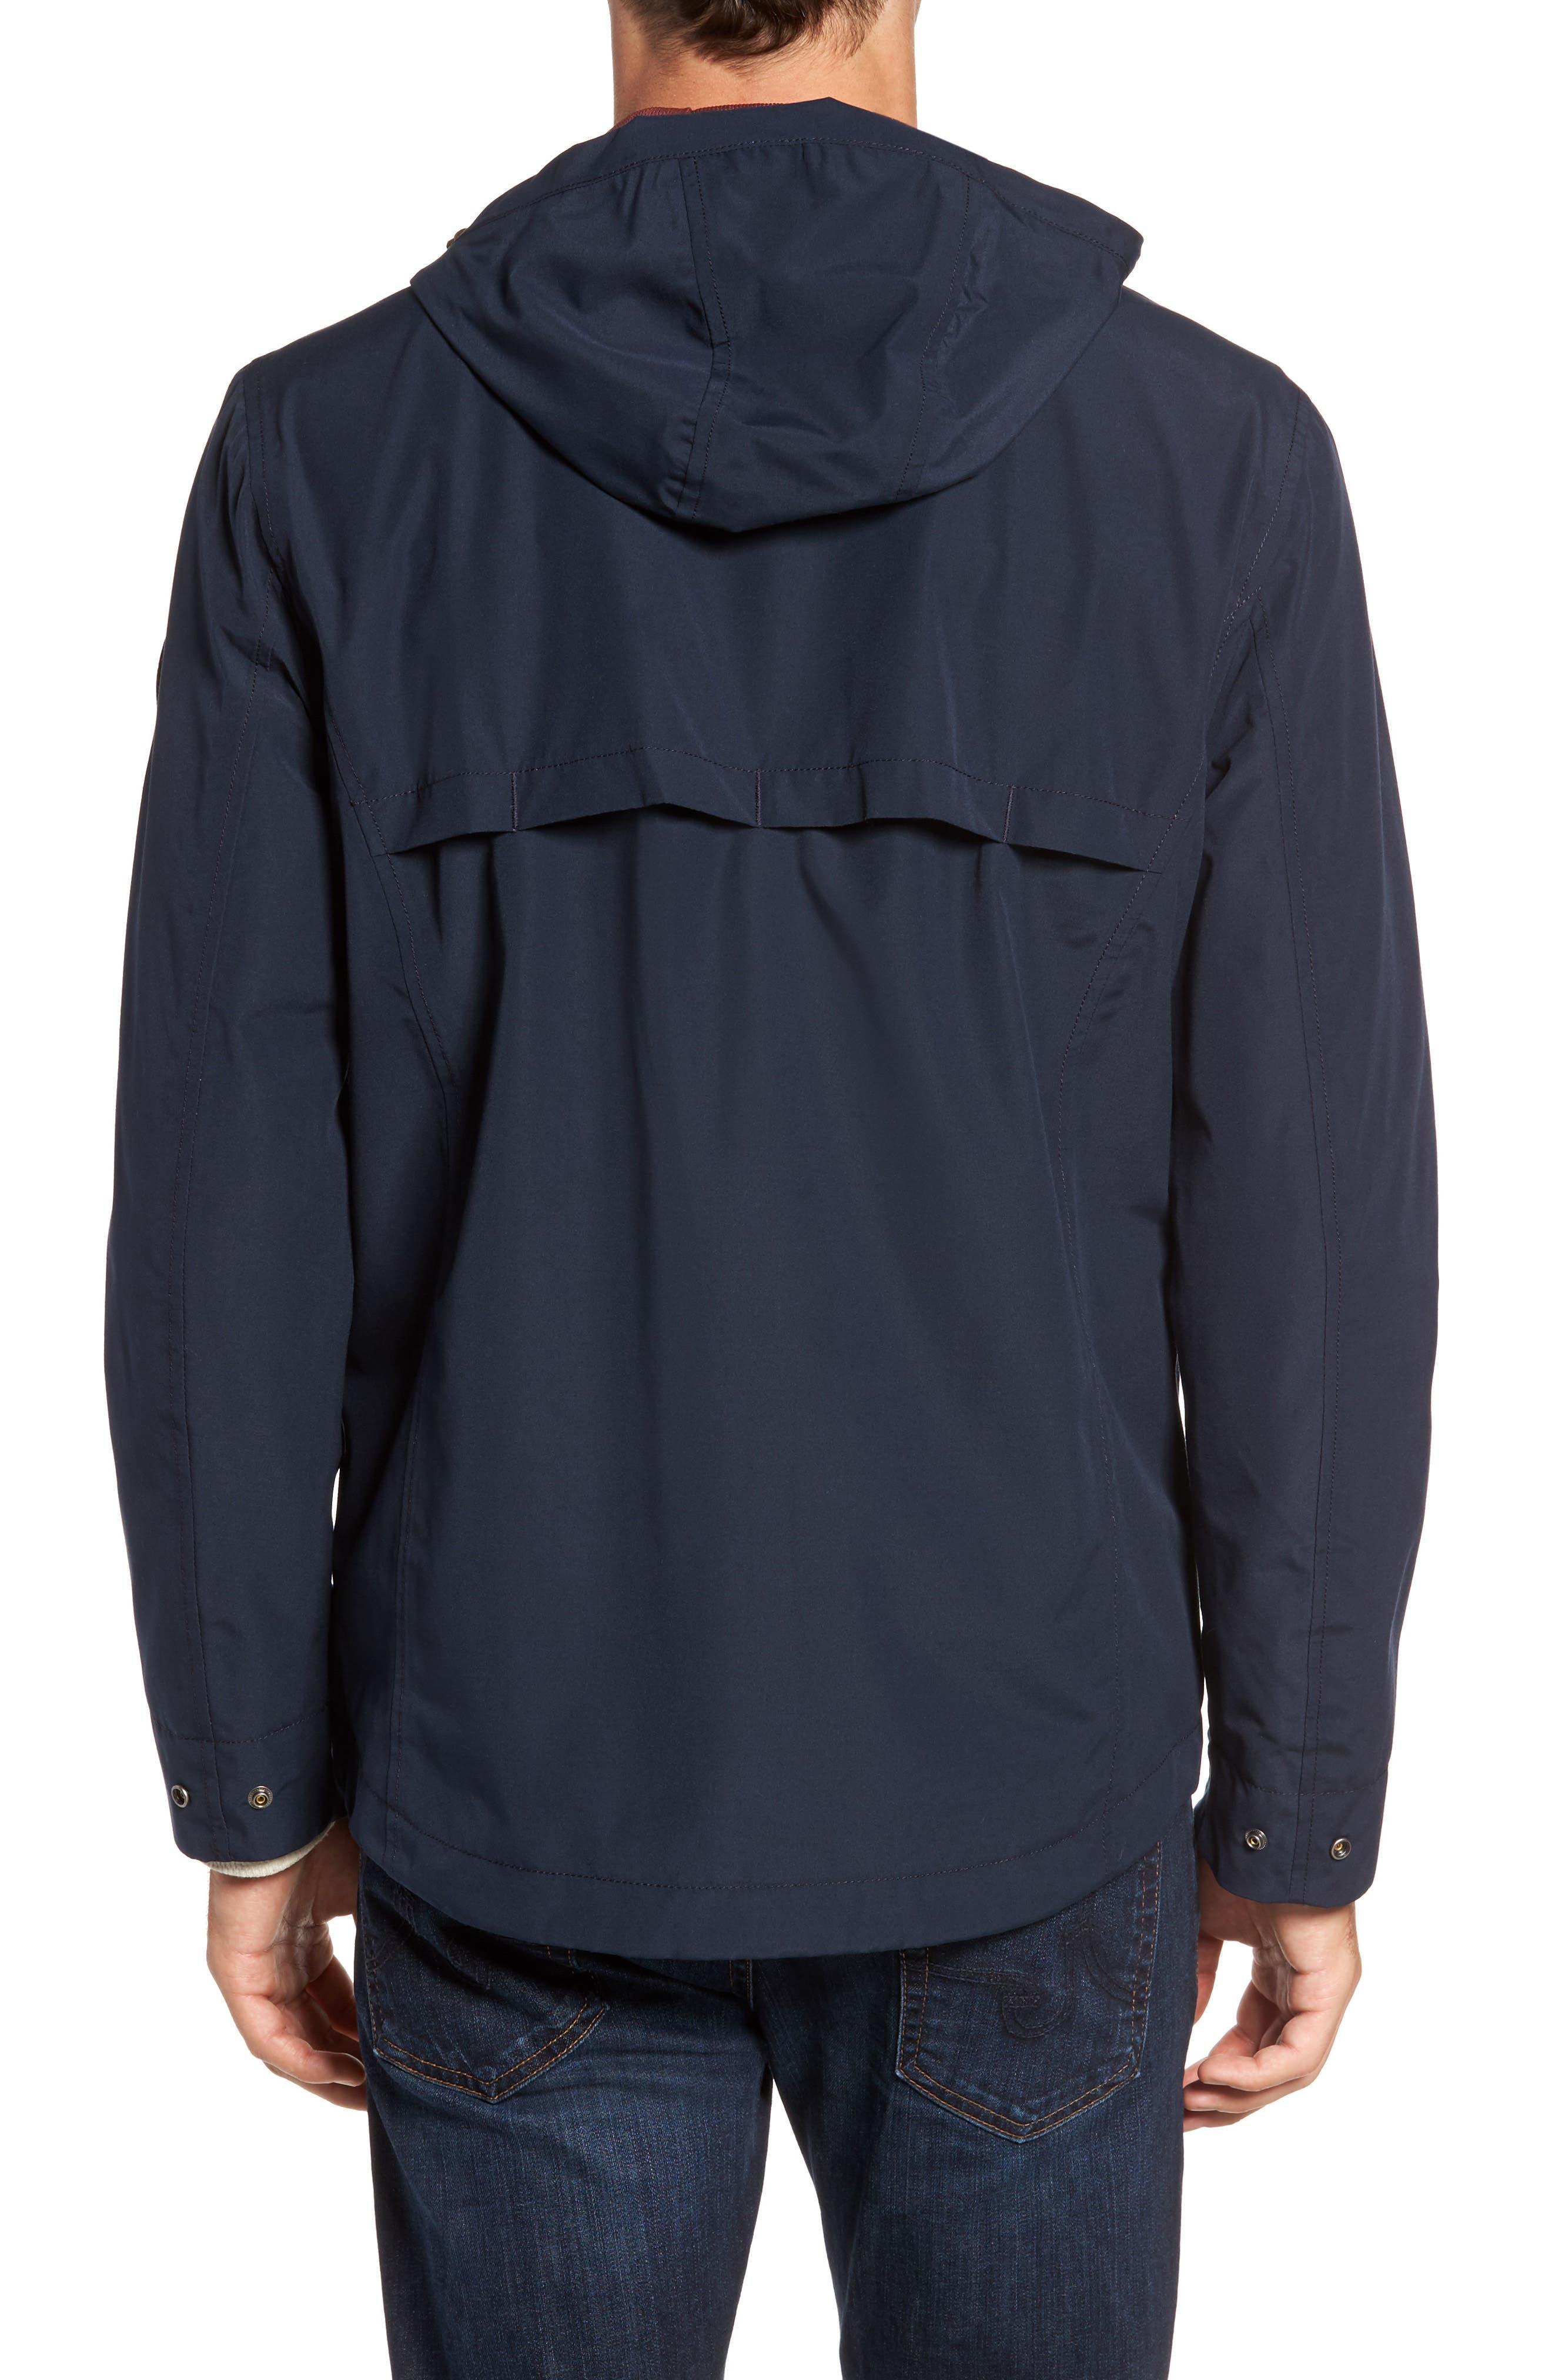 Ragged Mountain Packable Waterproof Jacket,                             Alternate thumbnail 4, color,